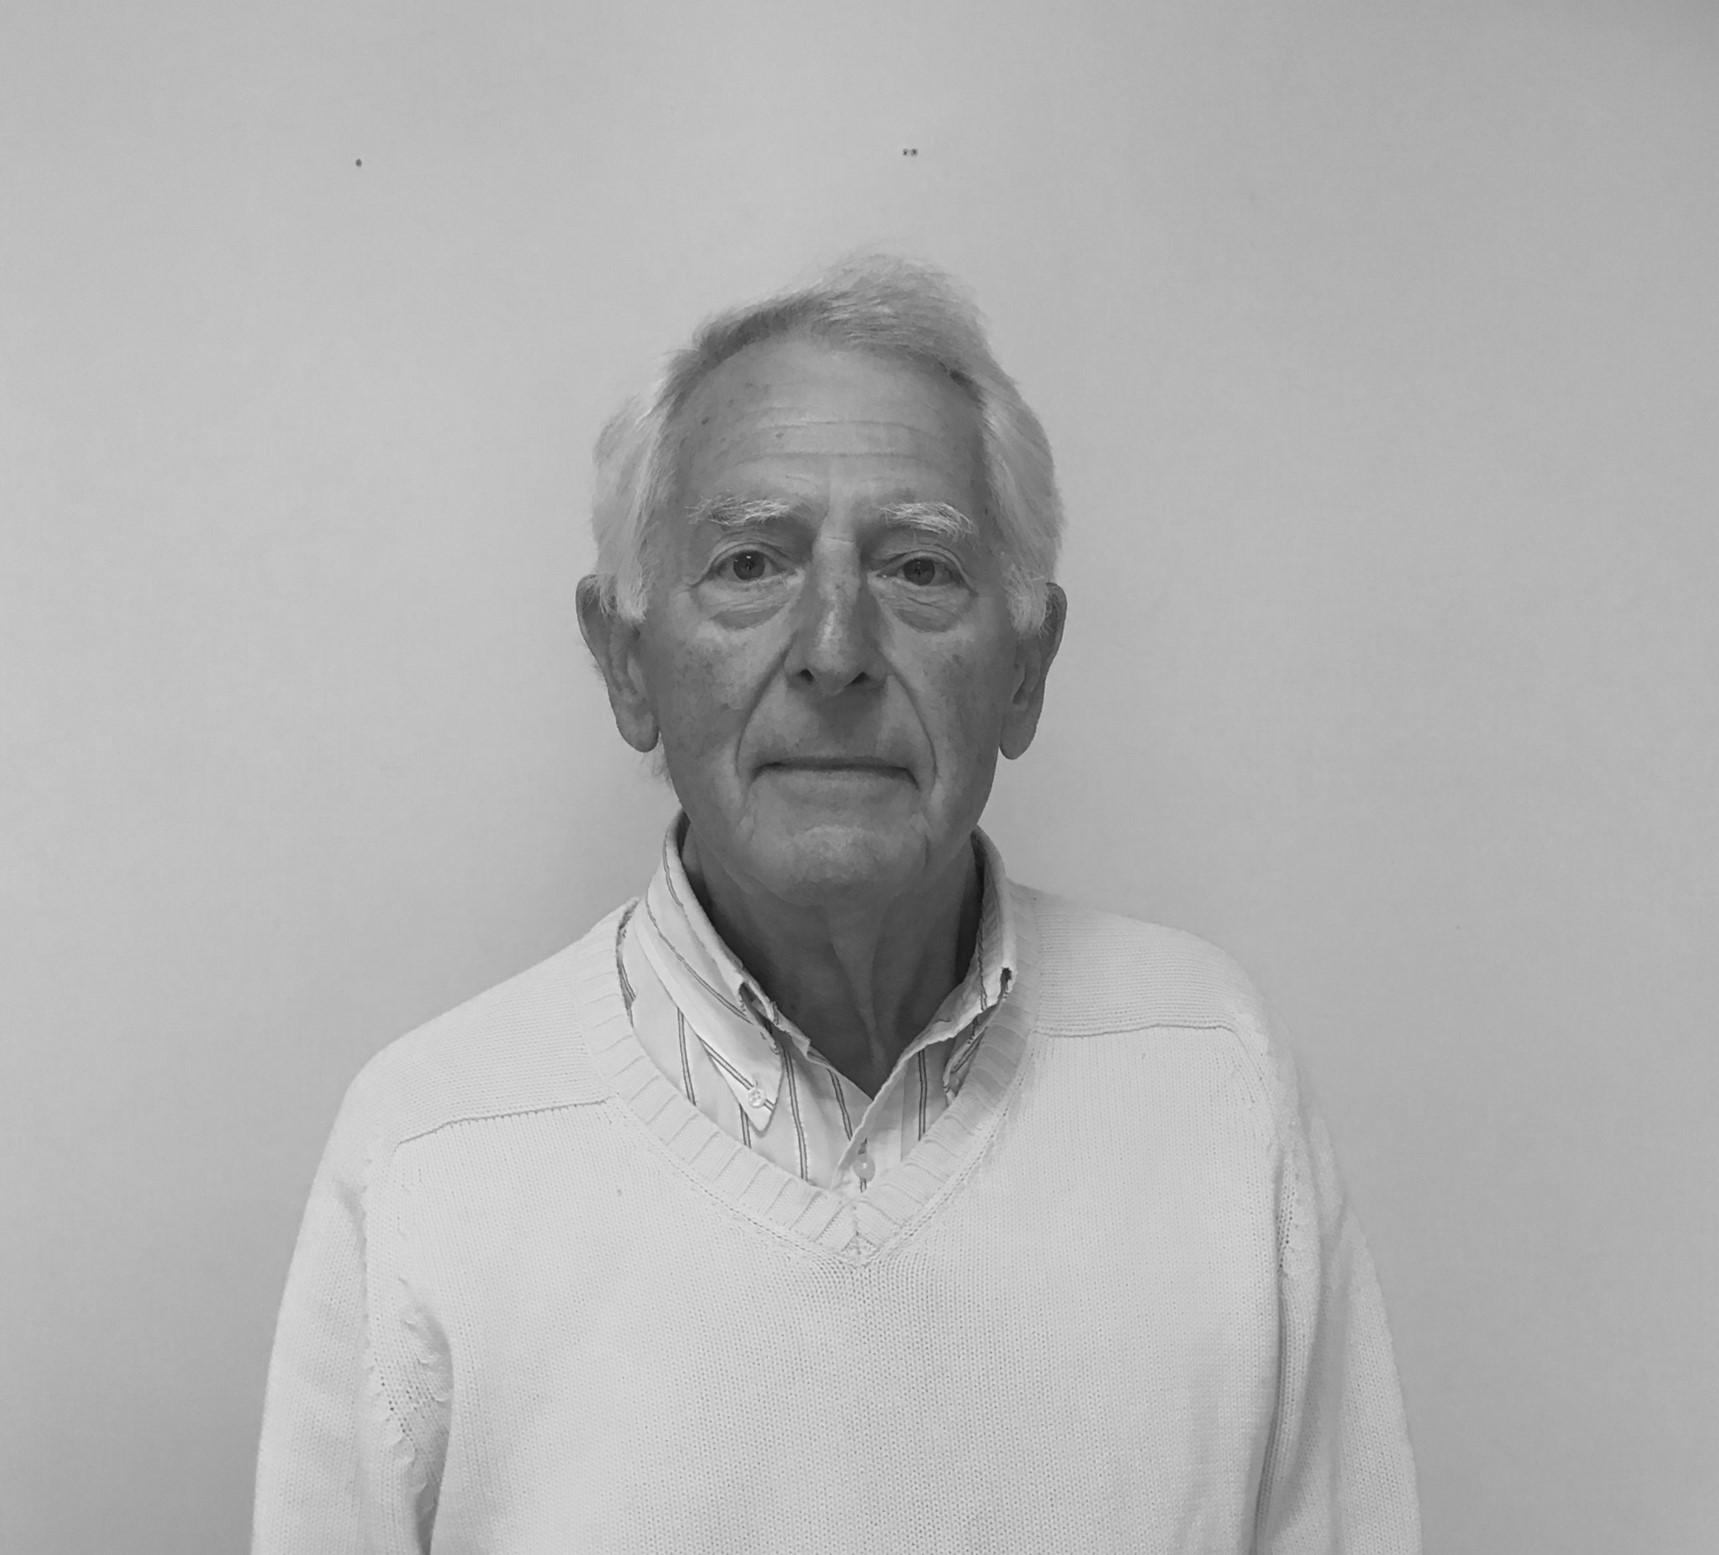 Steve Jaggard